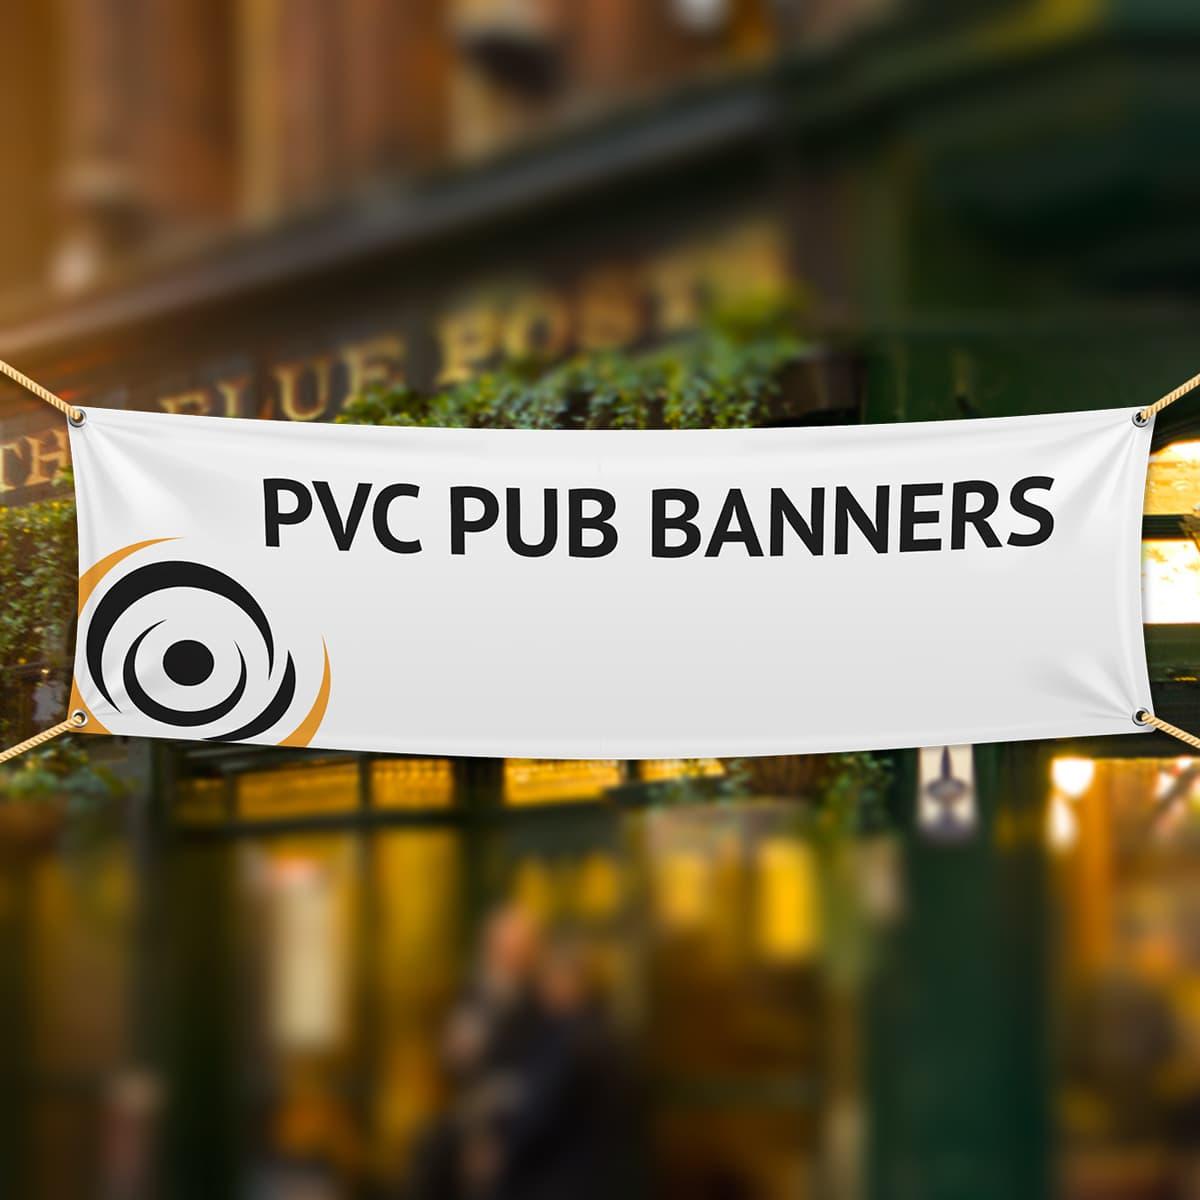 PVC Pub Banners